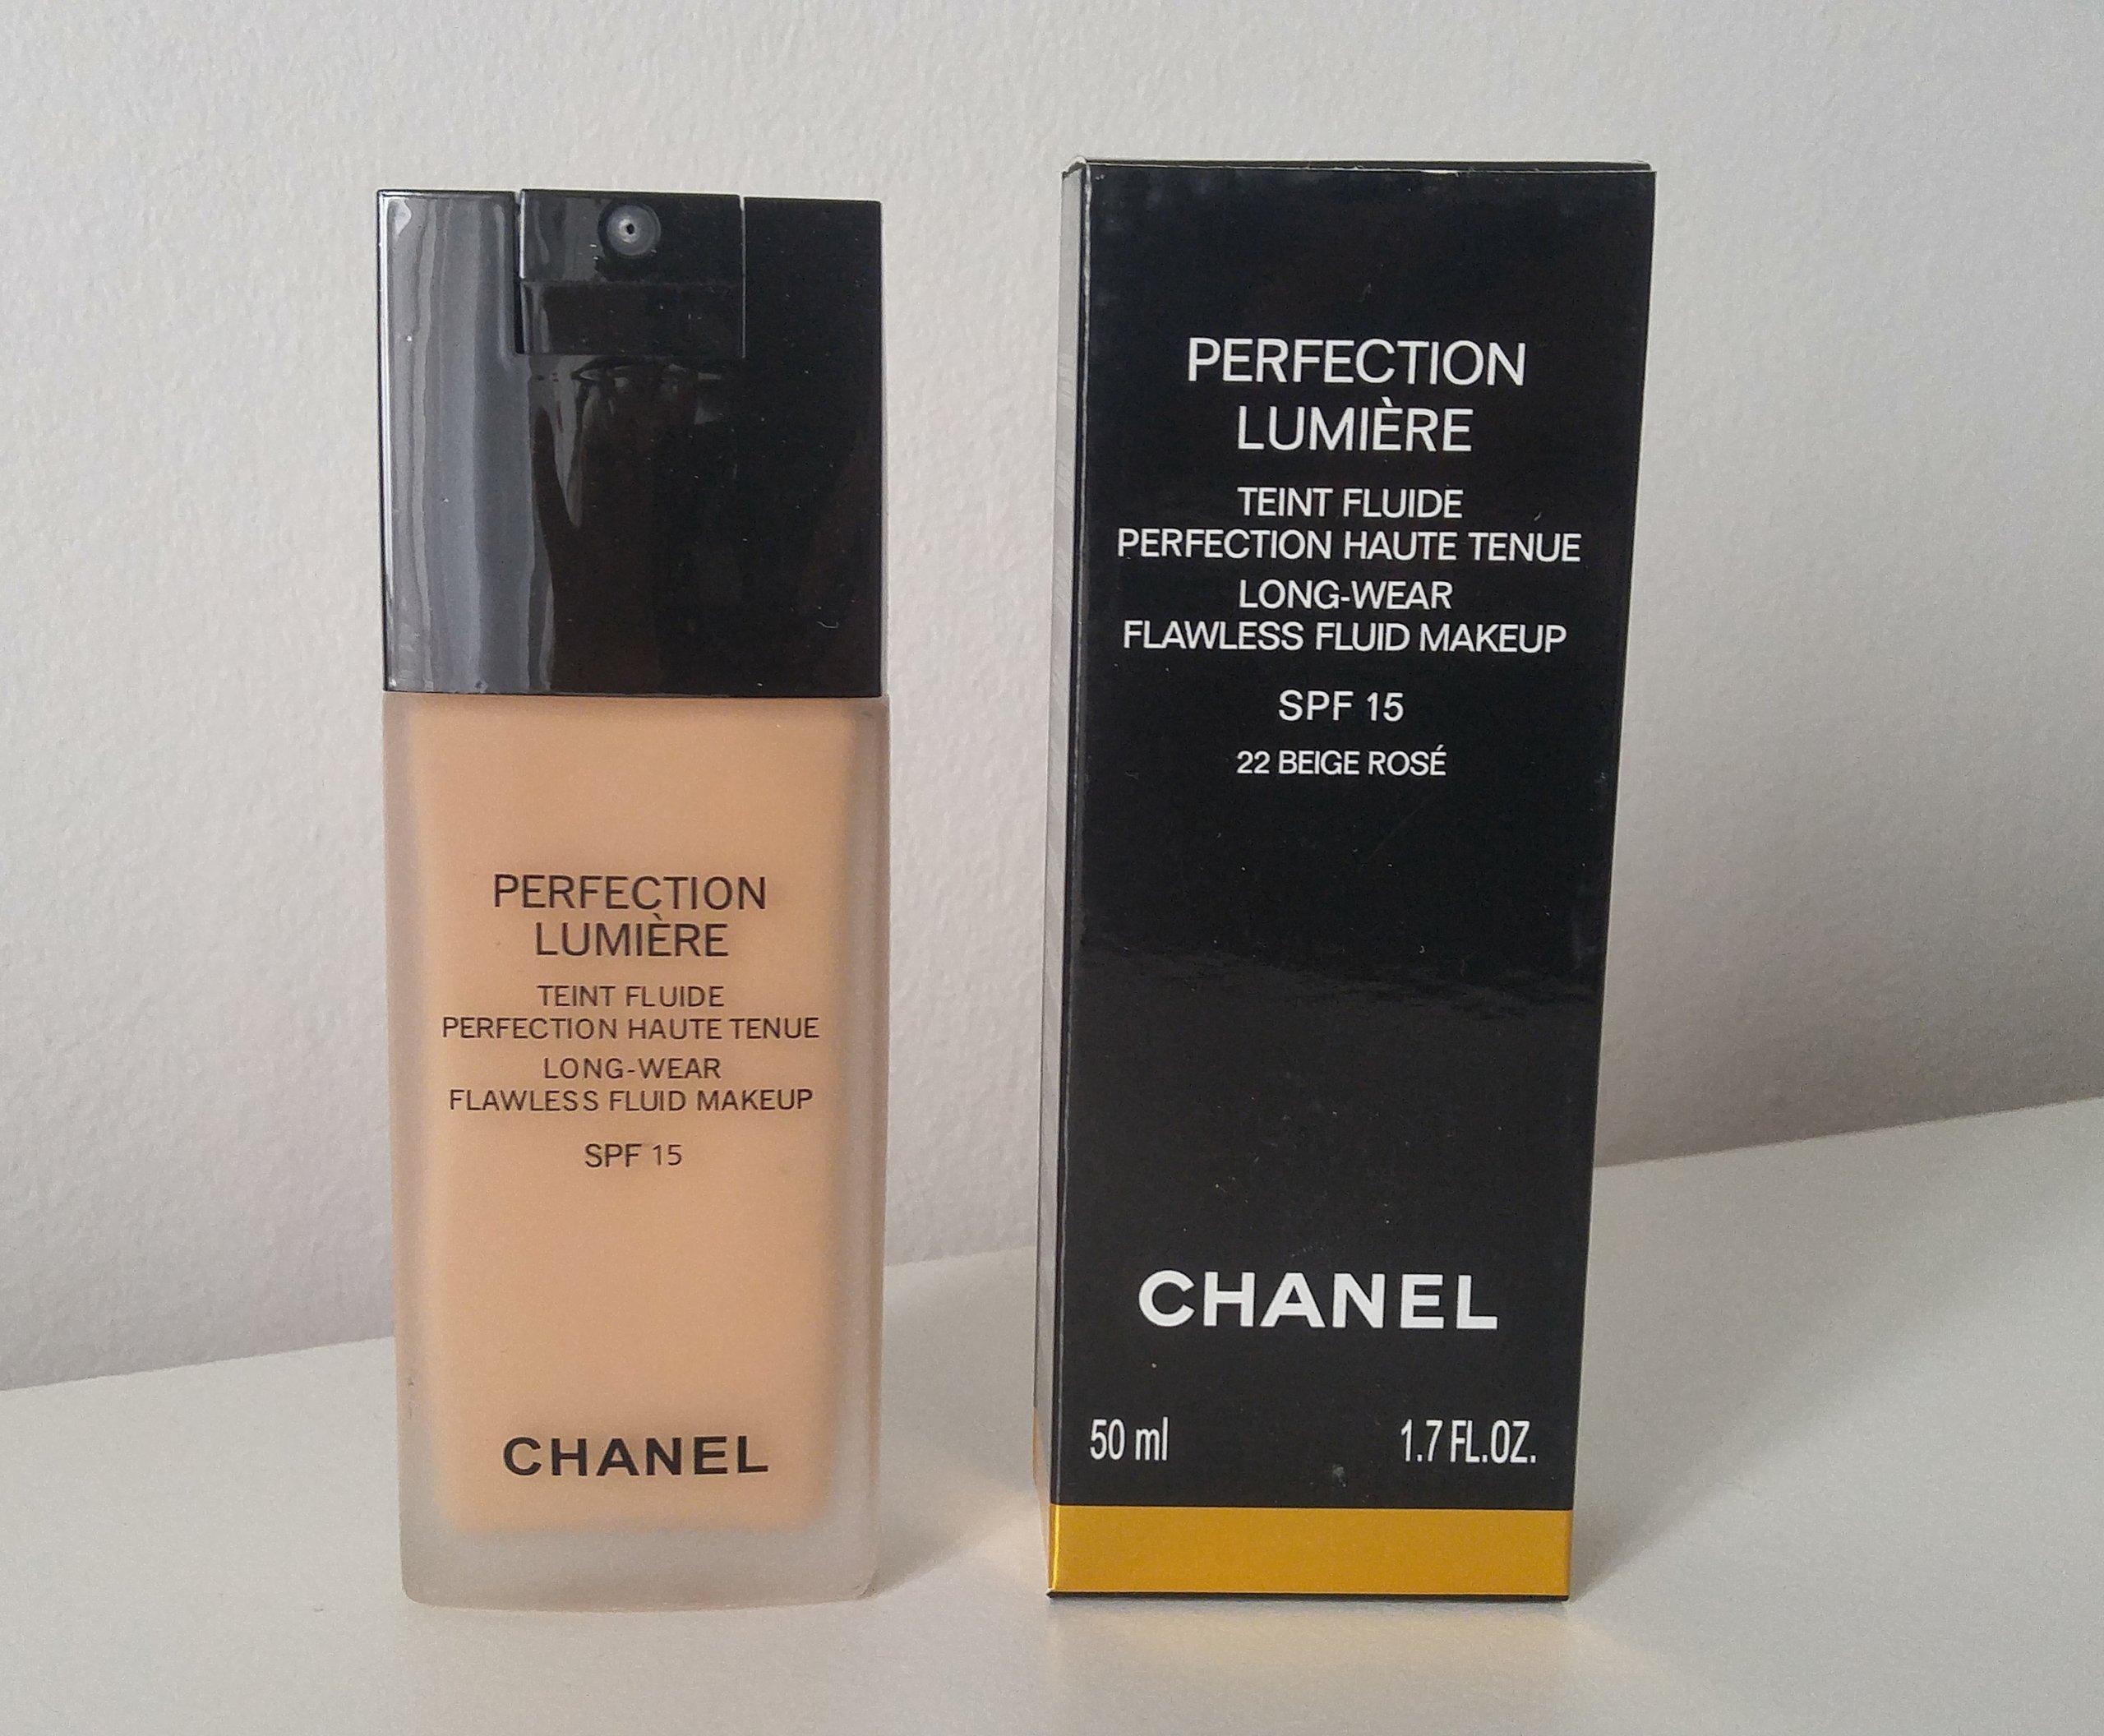 8add1062dce48 Chanel PERFECTION LUMIERE podkład fluid puder k.22 - 7161335018 ...